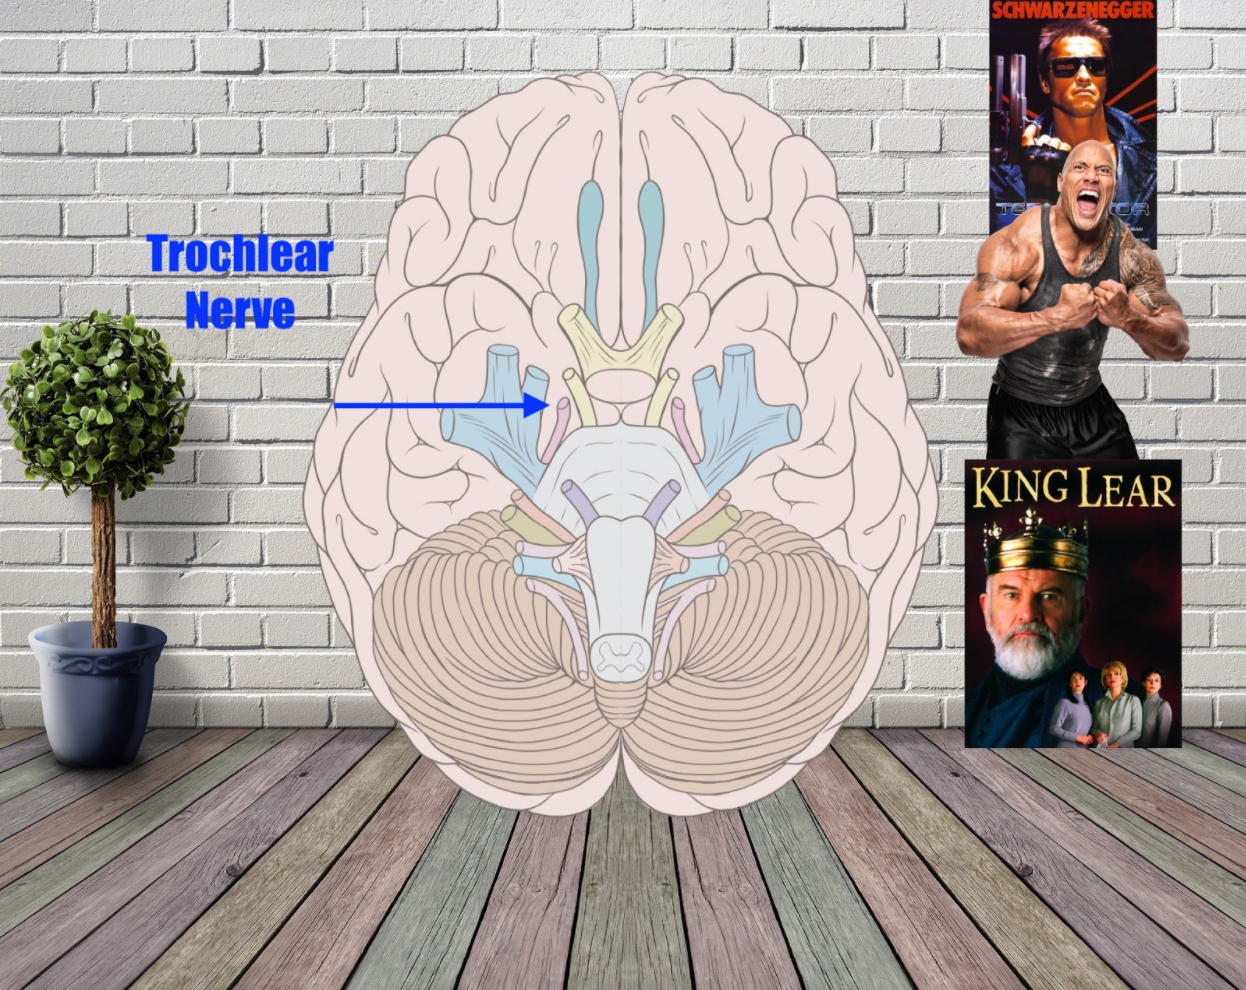 trochlear nerve mnemonic example